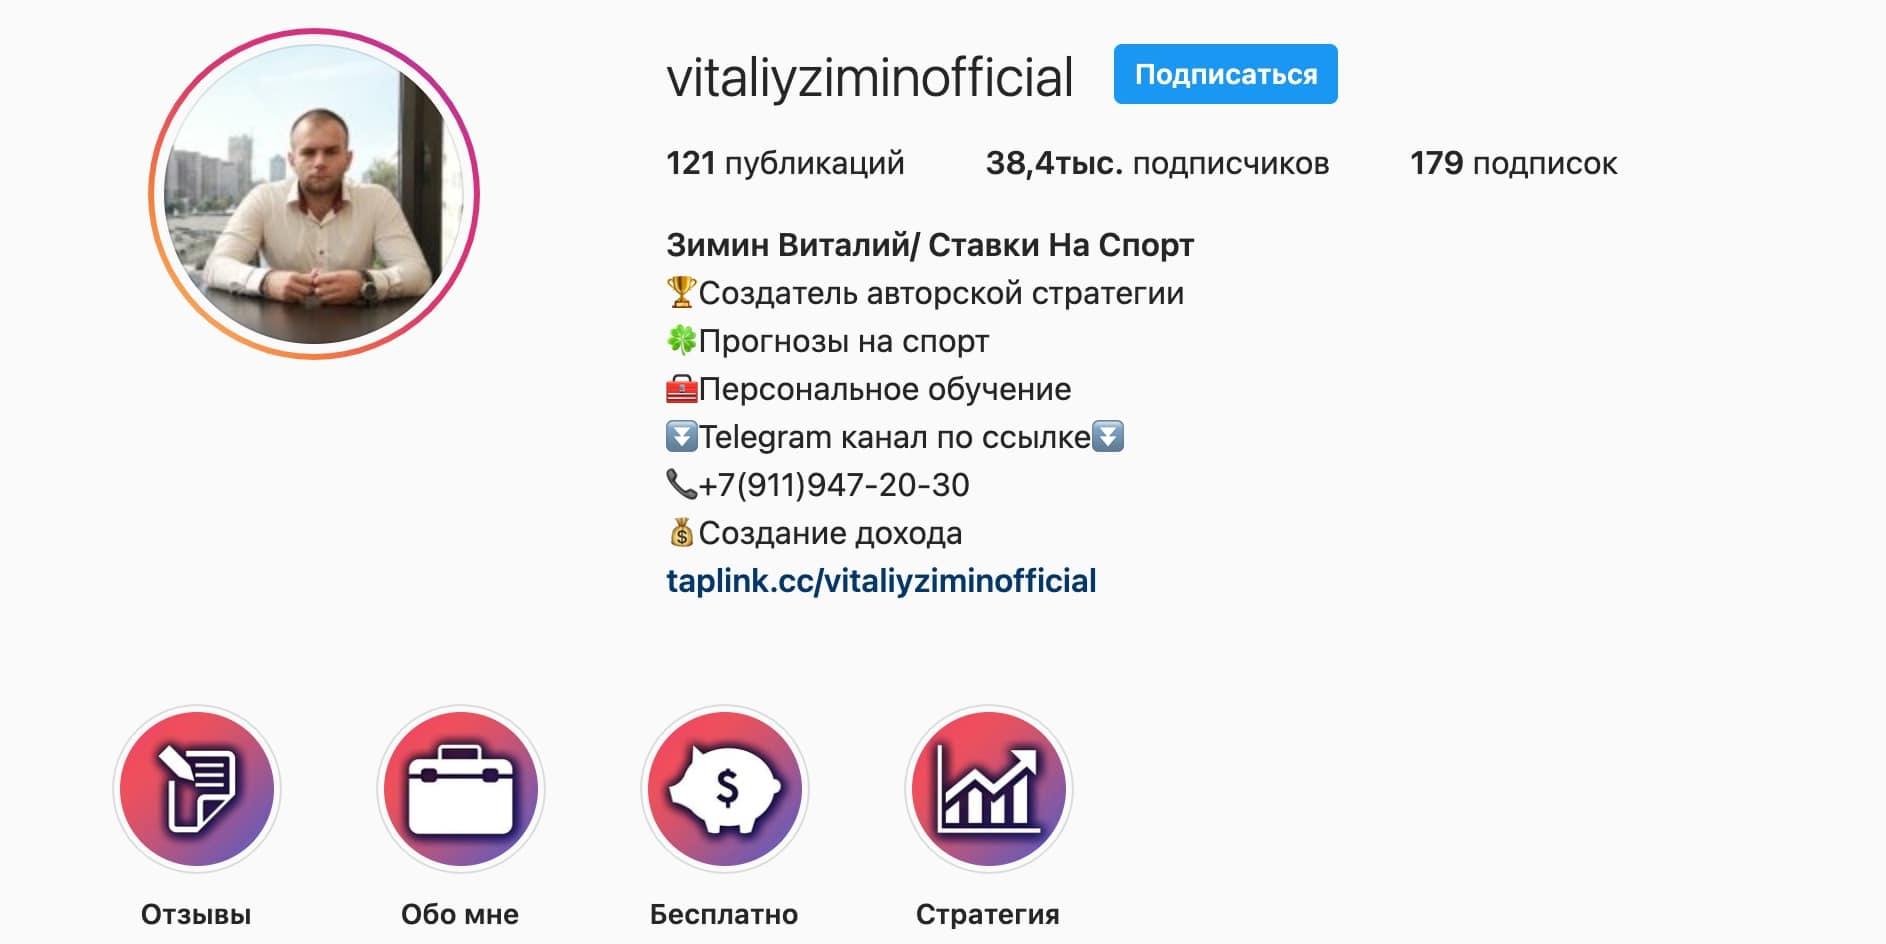 Инстаграм аккаунт каппера Виталия Зимина